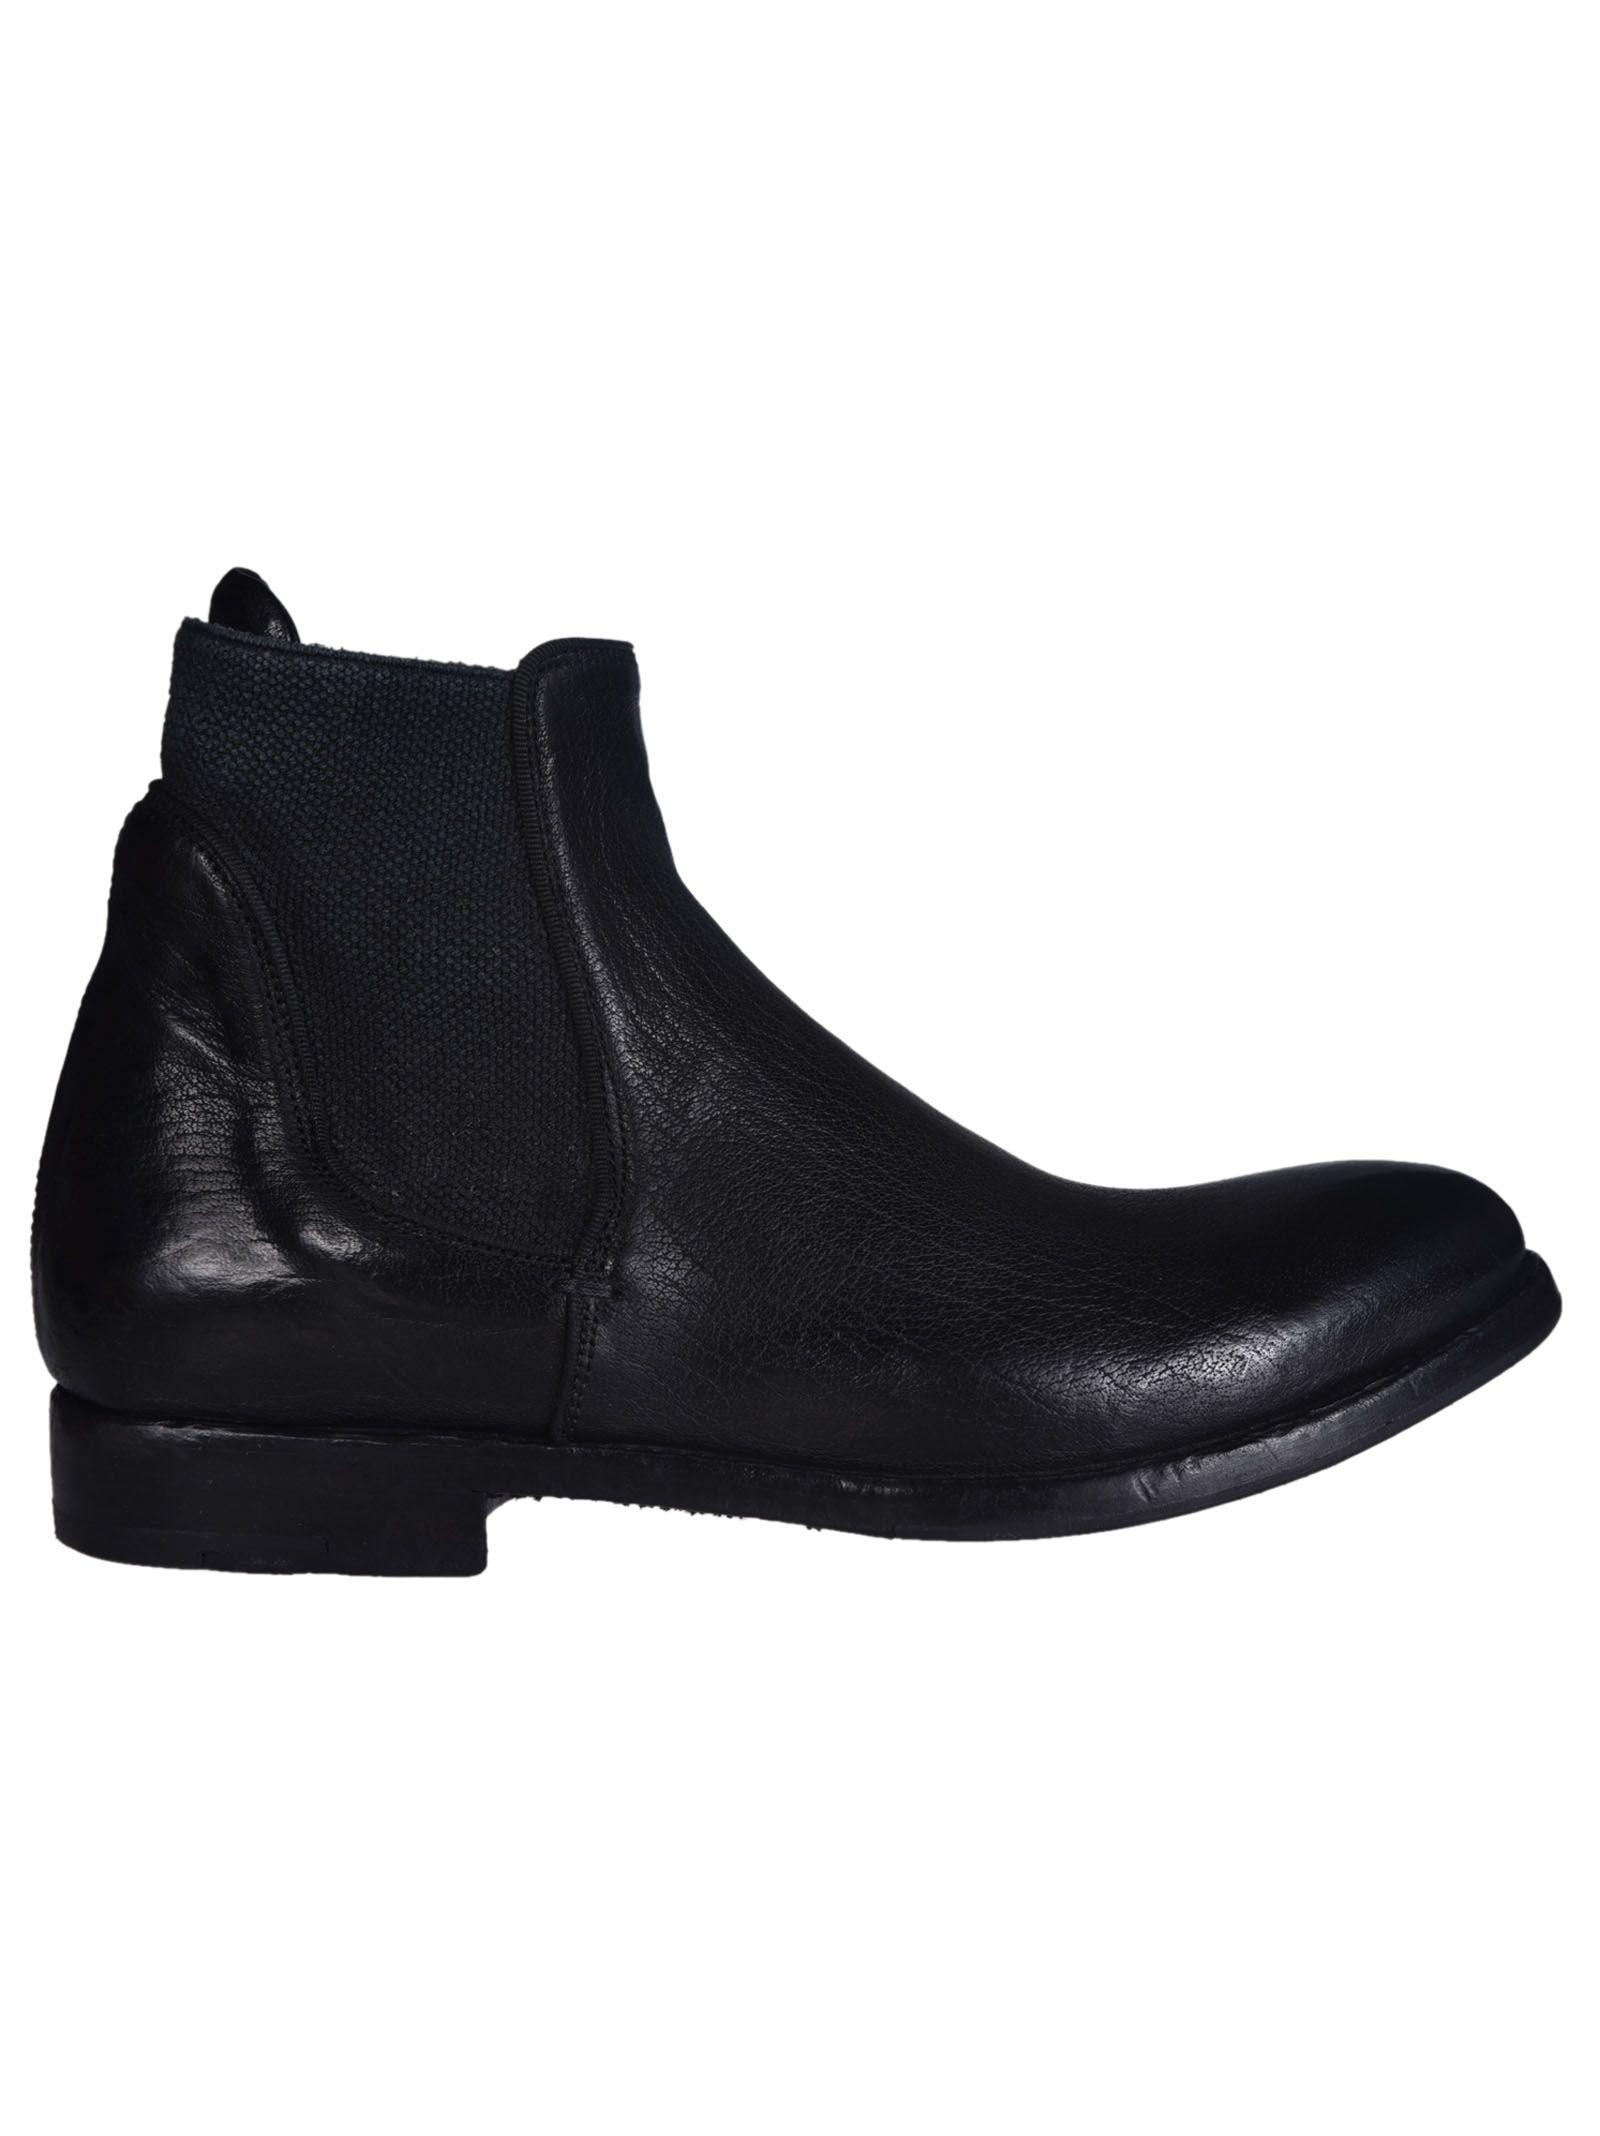 Alberto Fasciani 'sveva' Leather Boots